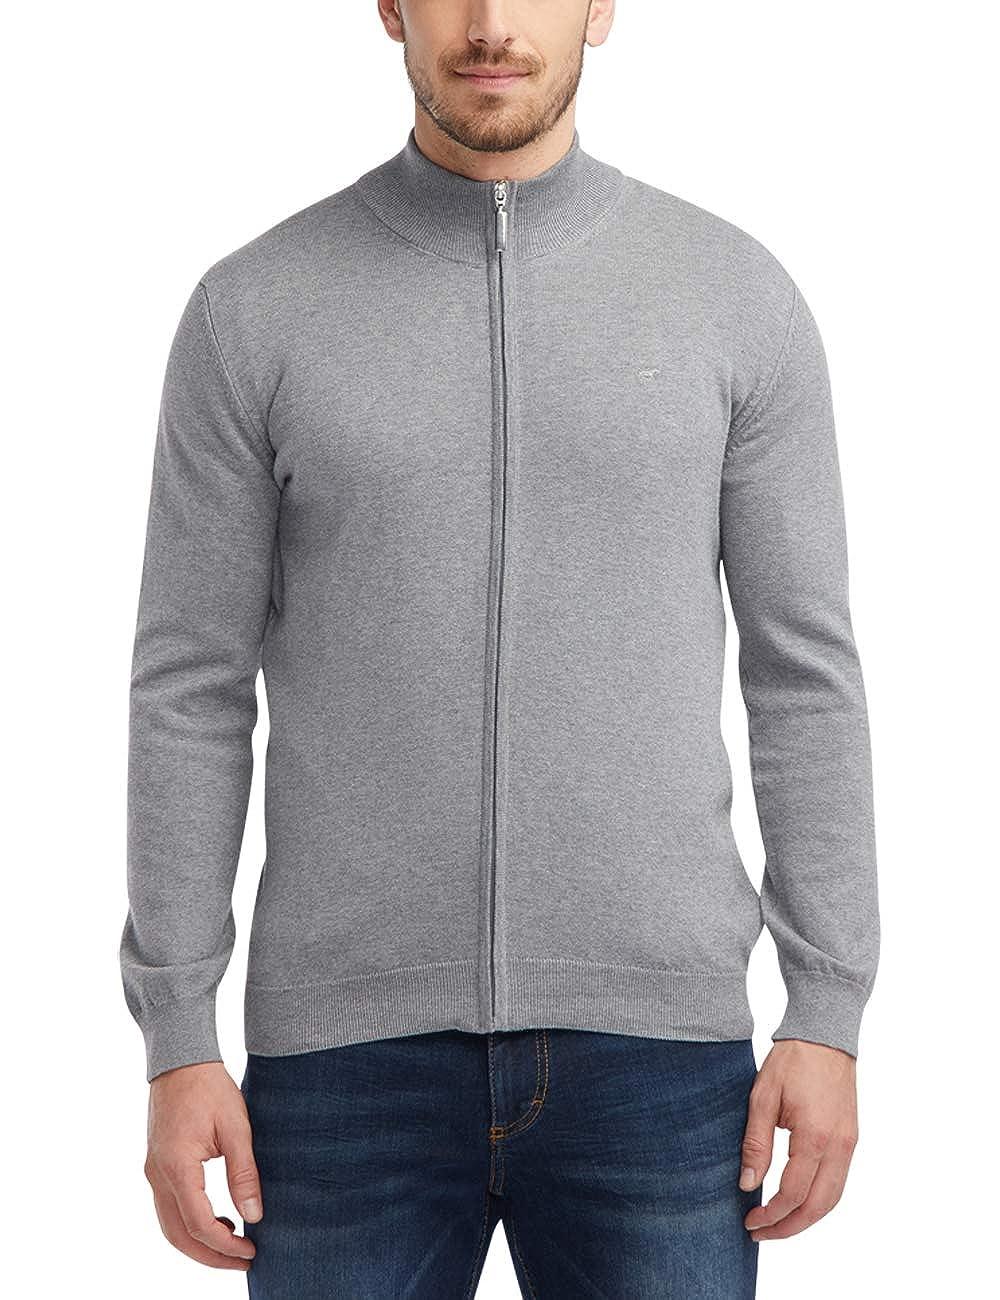 MUSTANG Herren Standard Fit Basic-Cardigan B07L5VGGQZ Strickjacken Sehr gute Farbe